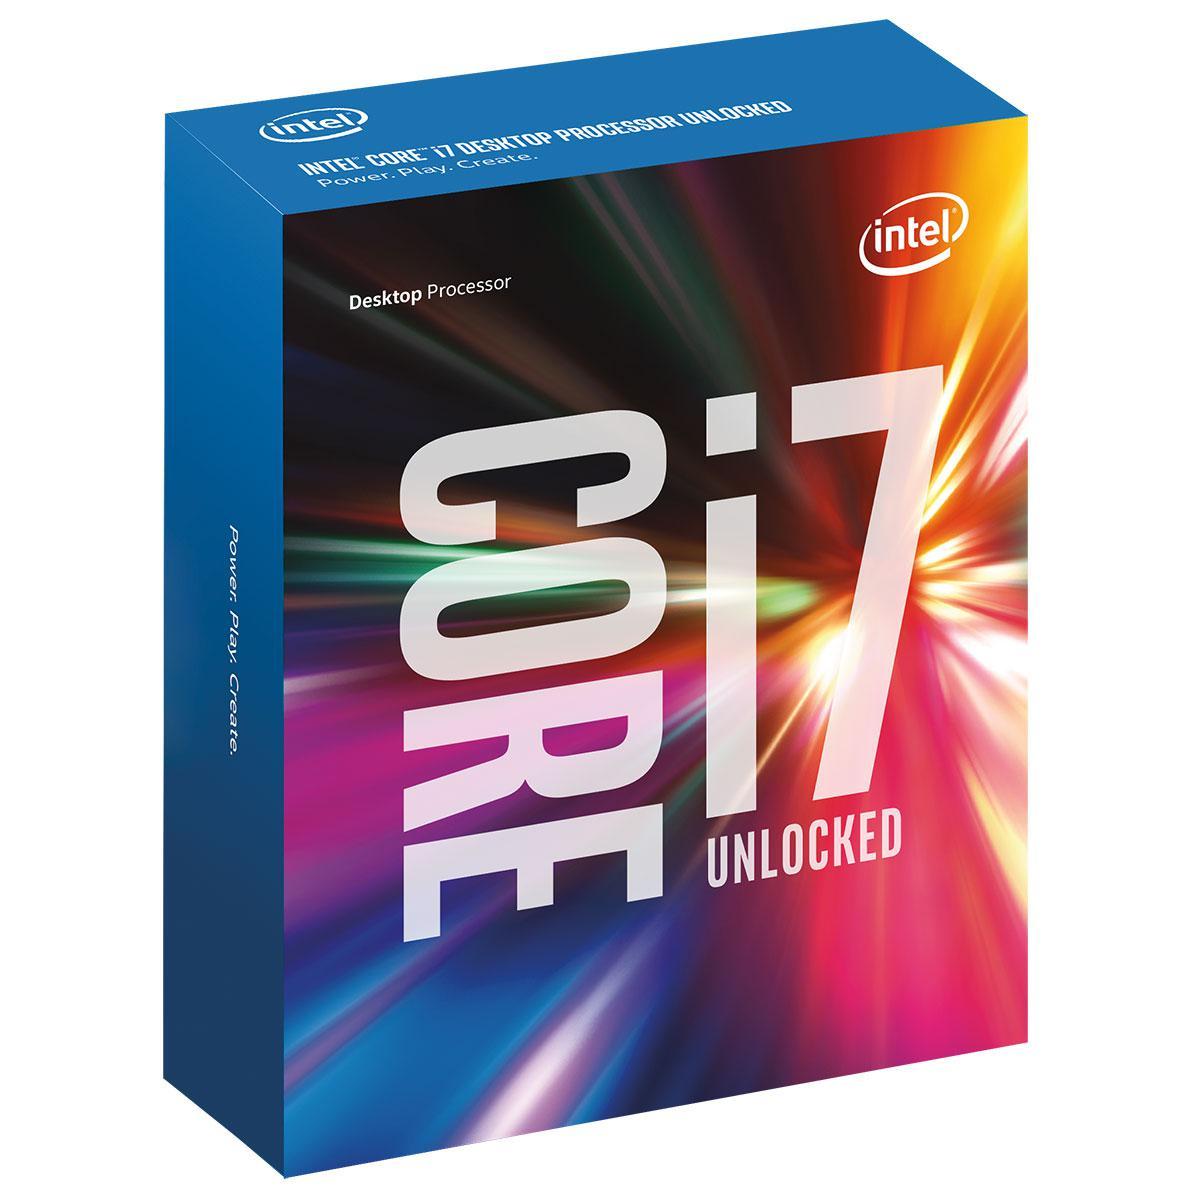 Processeur Intel Skylake Core i7 6700K 4 GHz Socket 1151